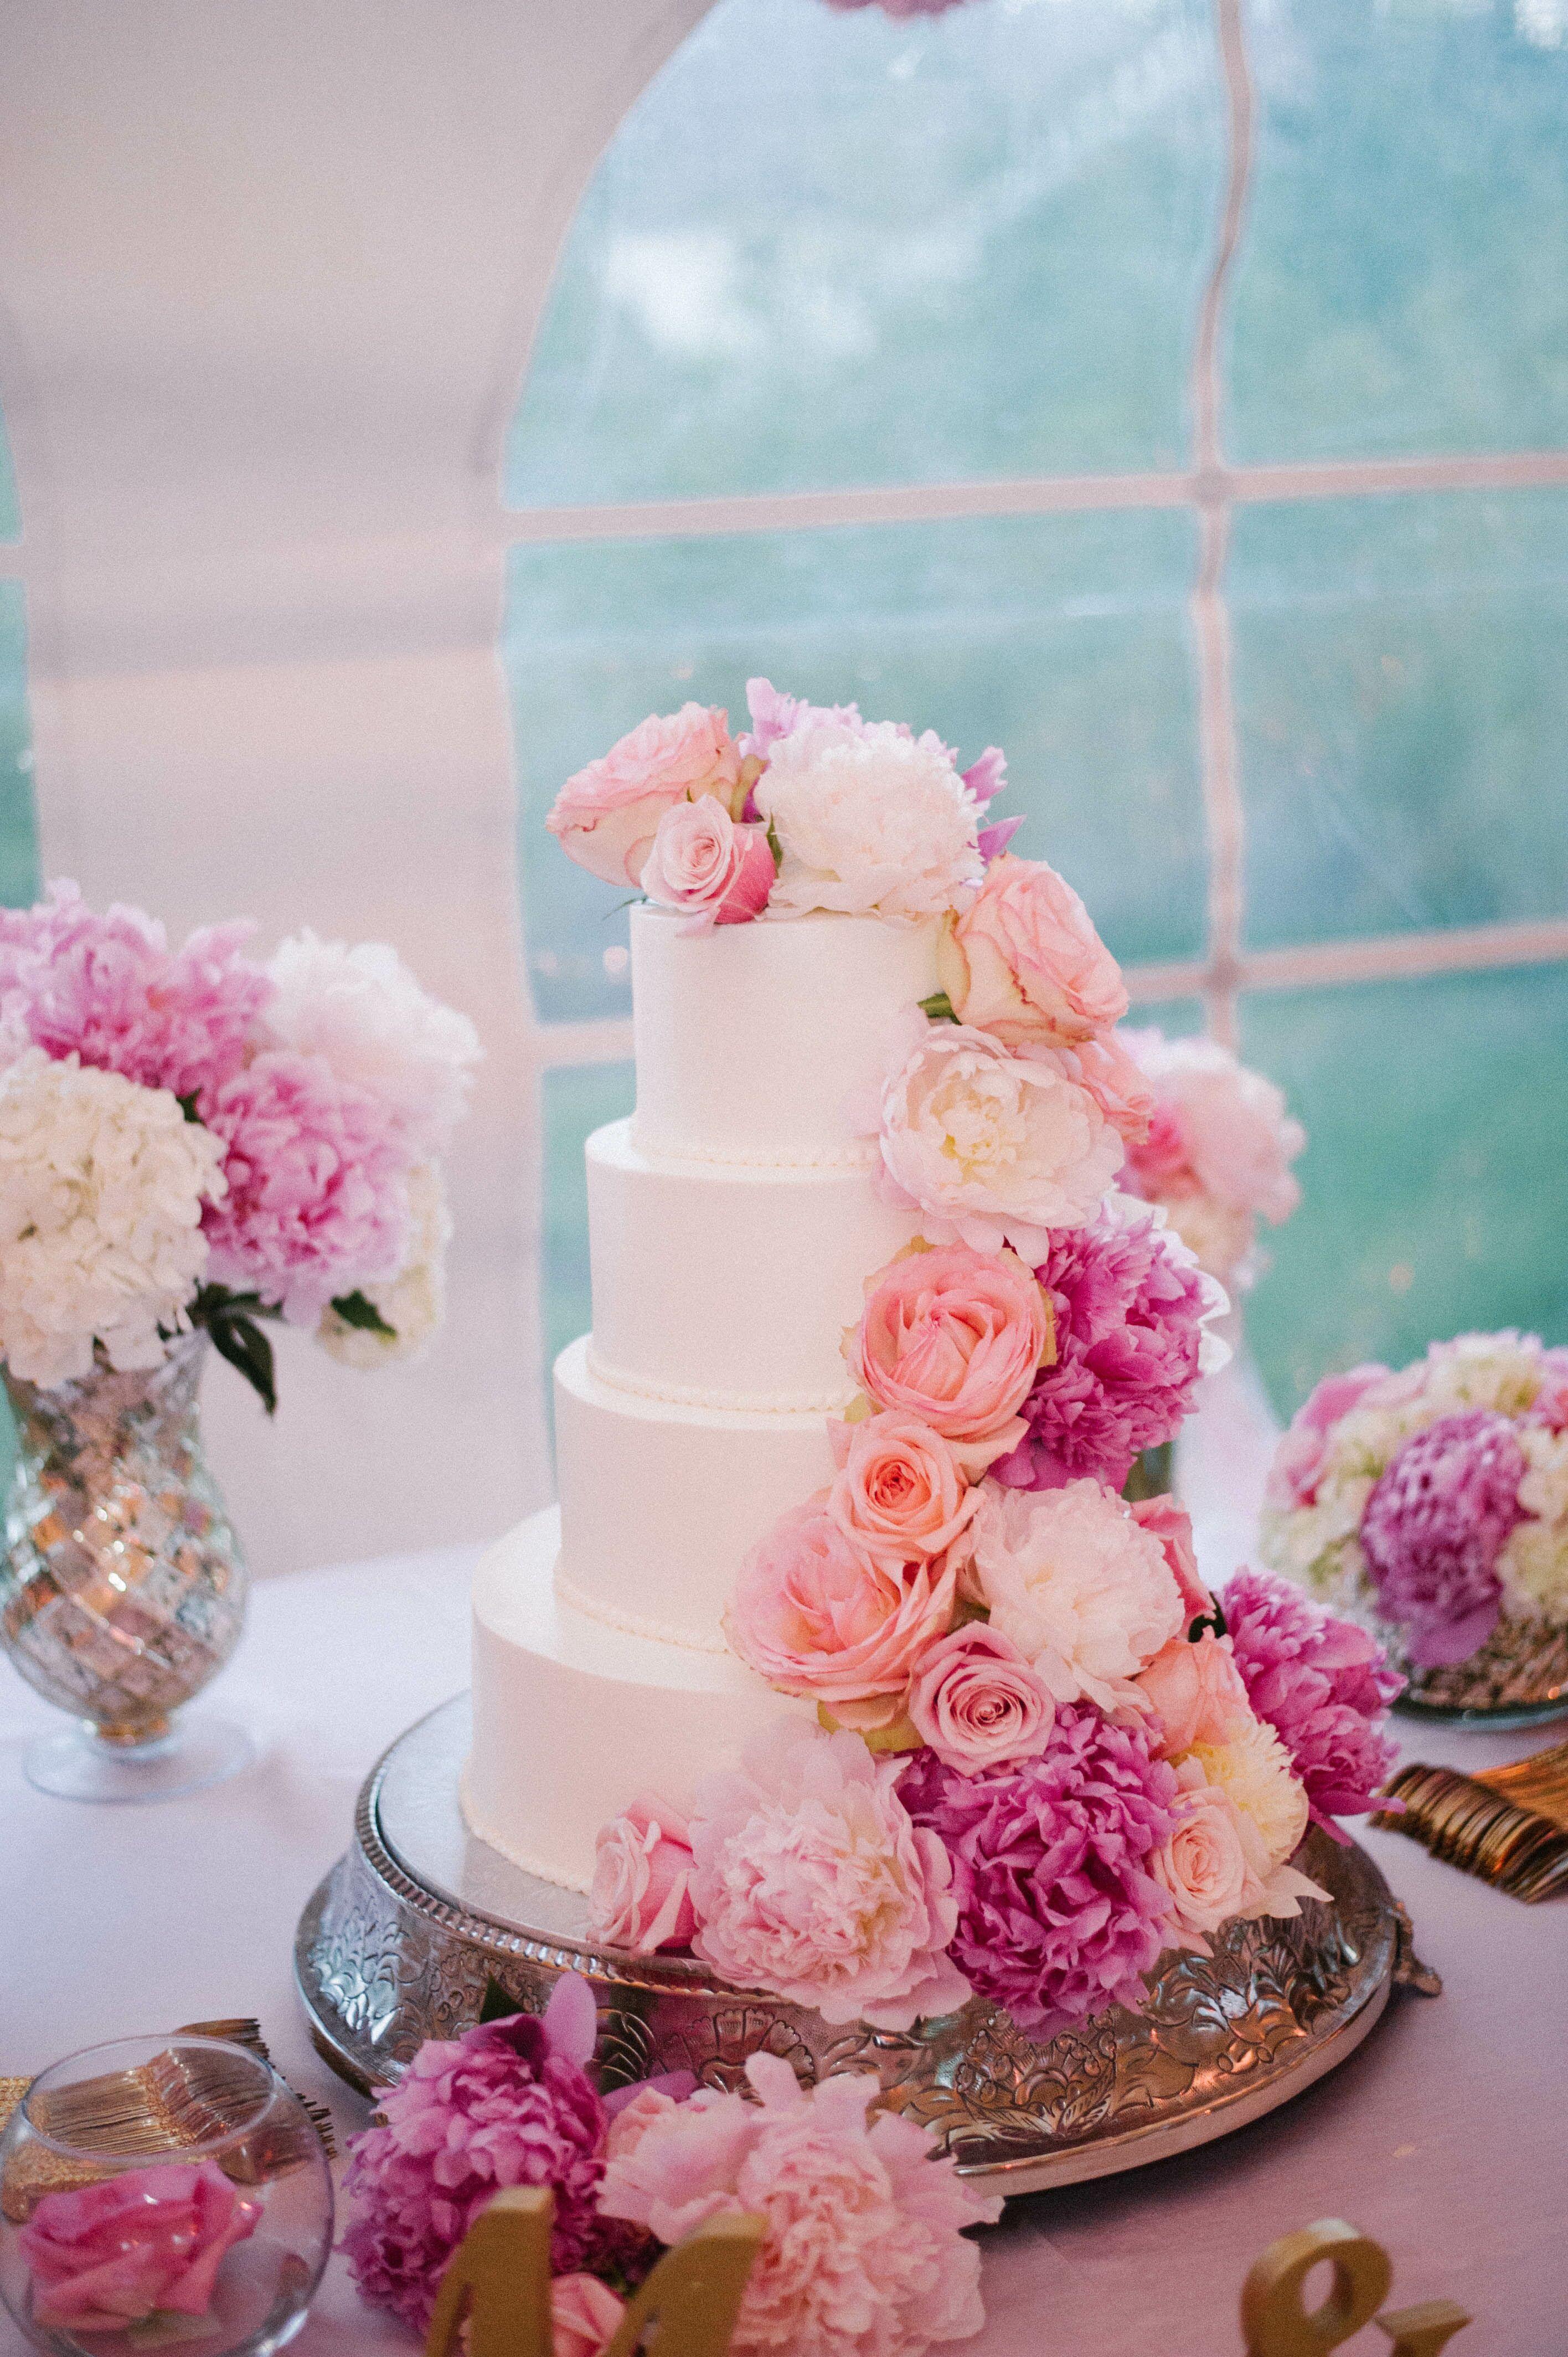 White Wedding Cake With Pink Peonies